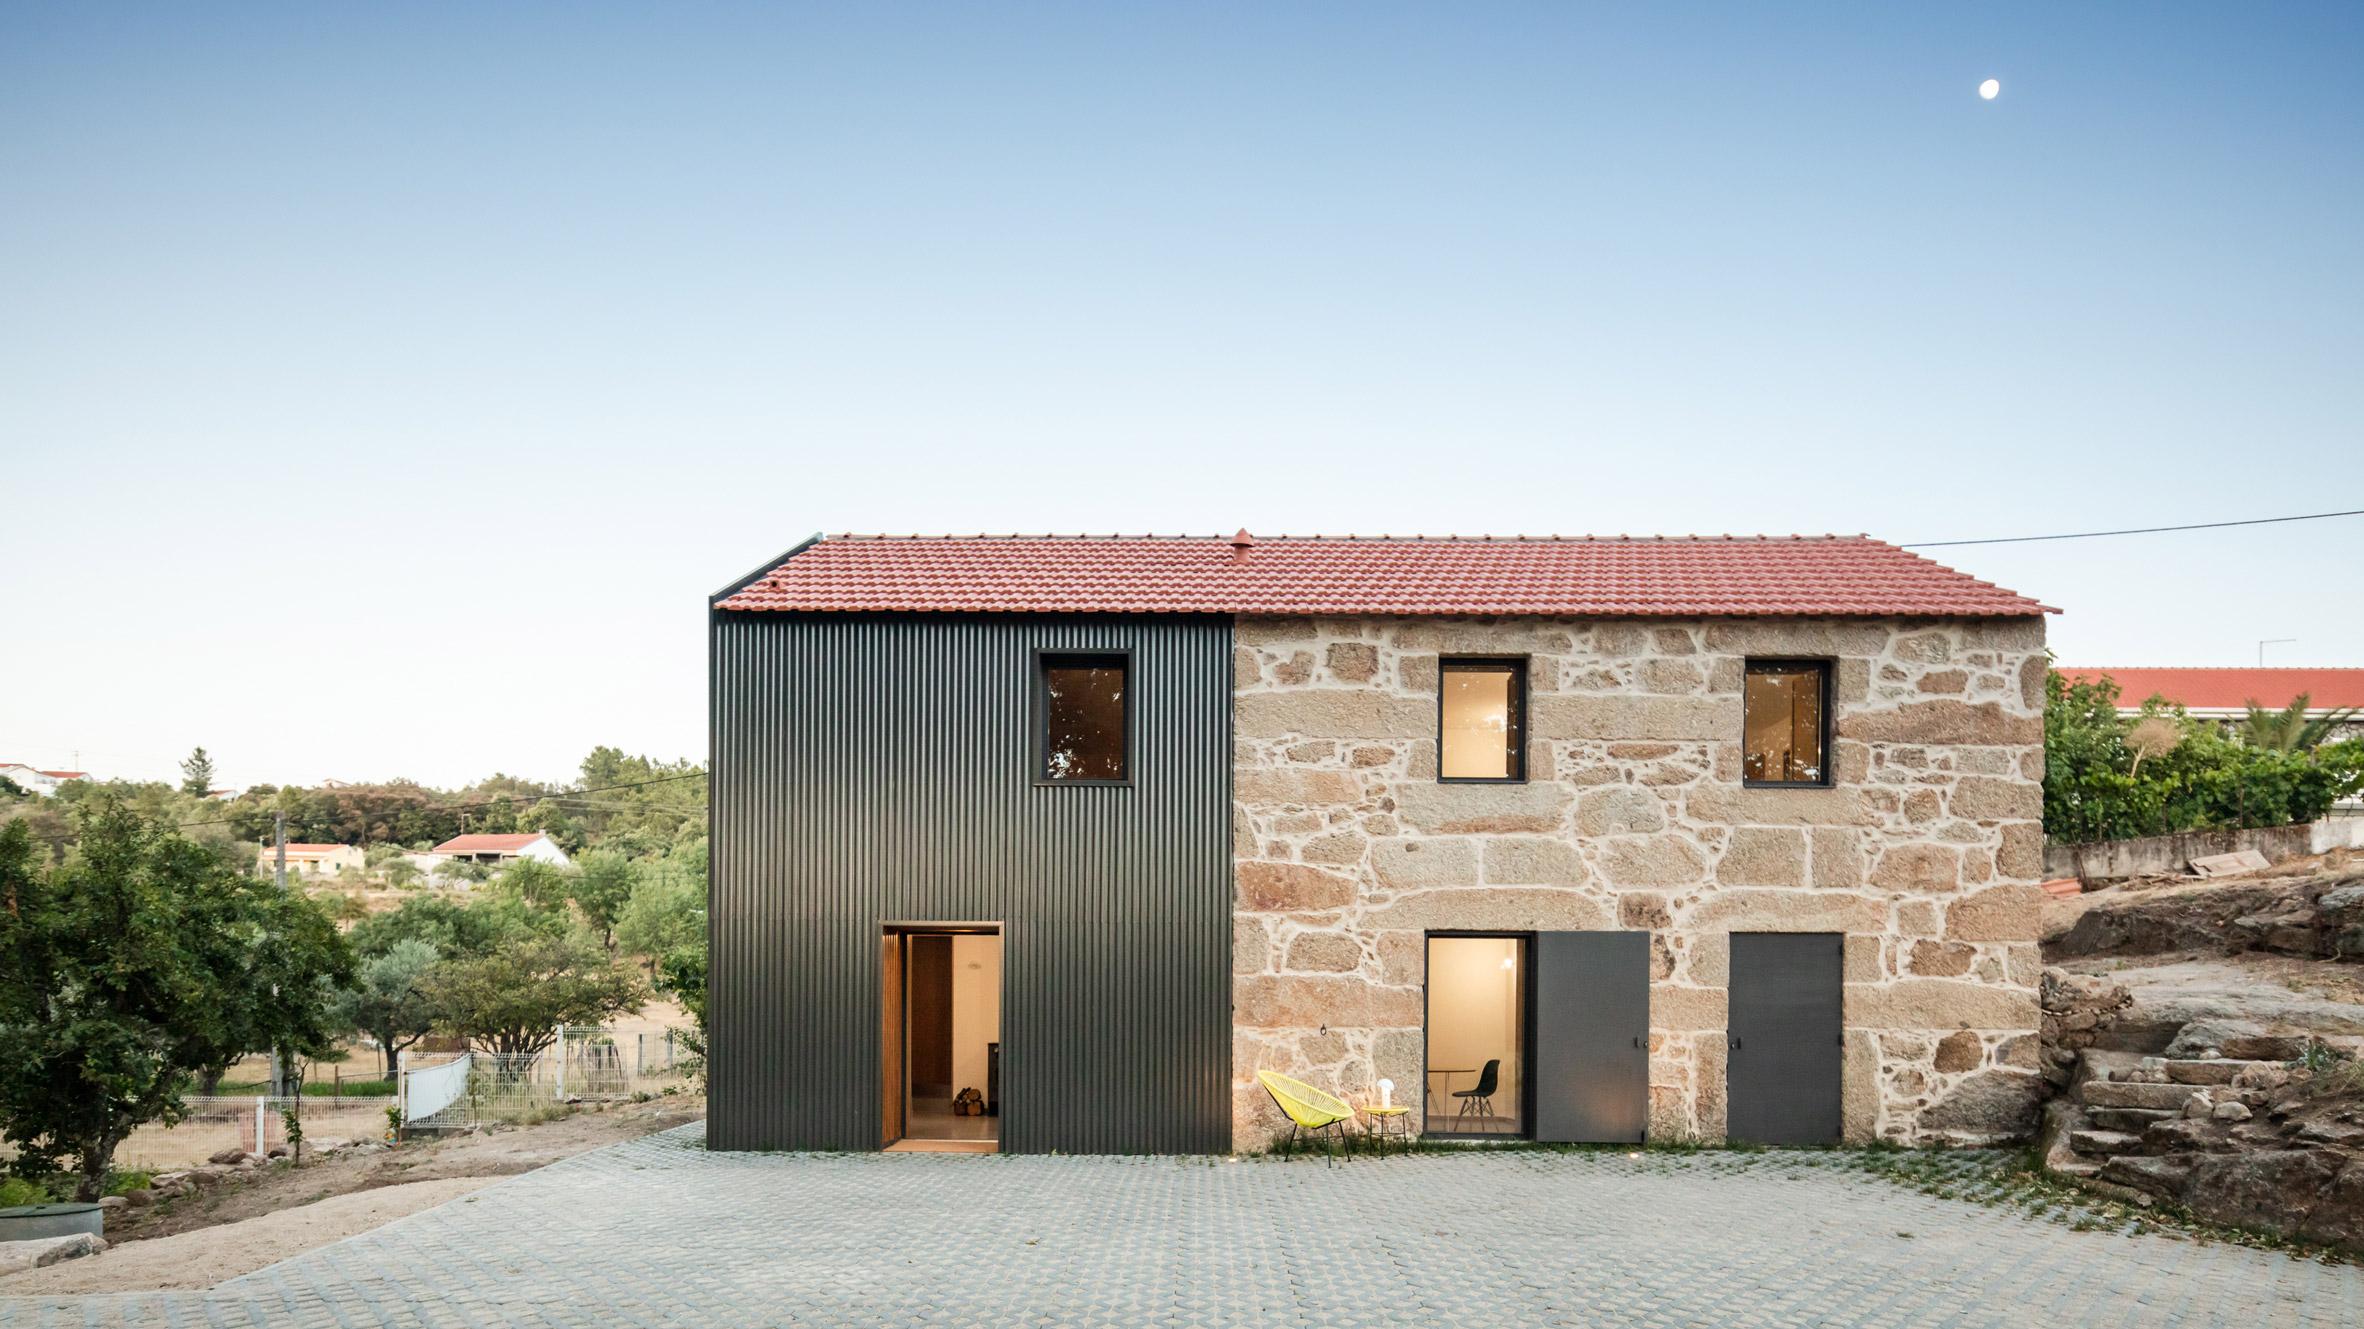 Filipe Pina and Maria Inês Costa bring abandoned Portuguese farmhouse back to life